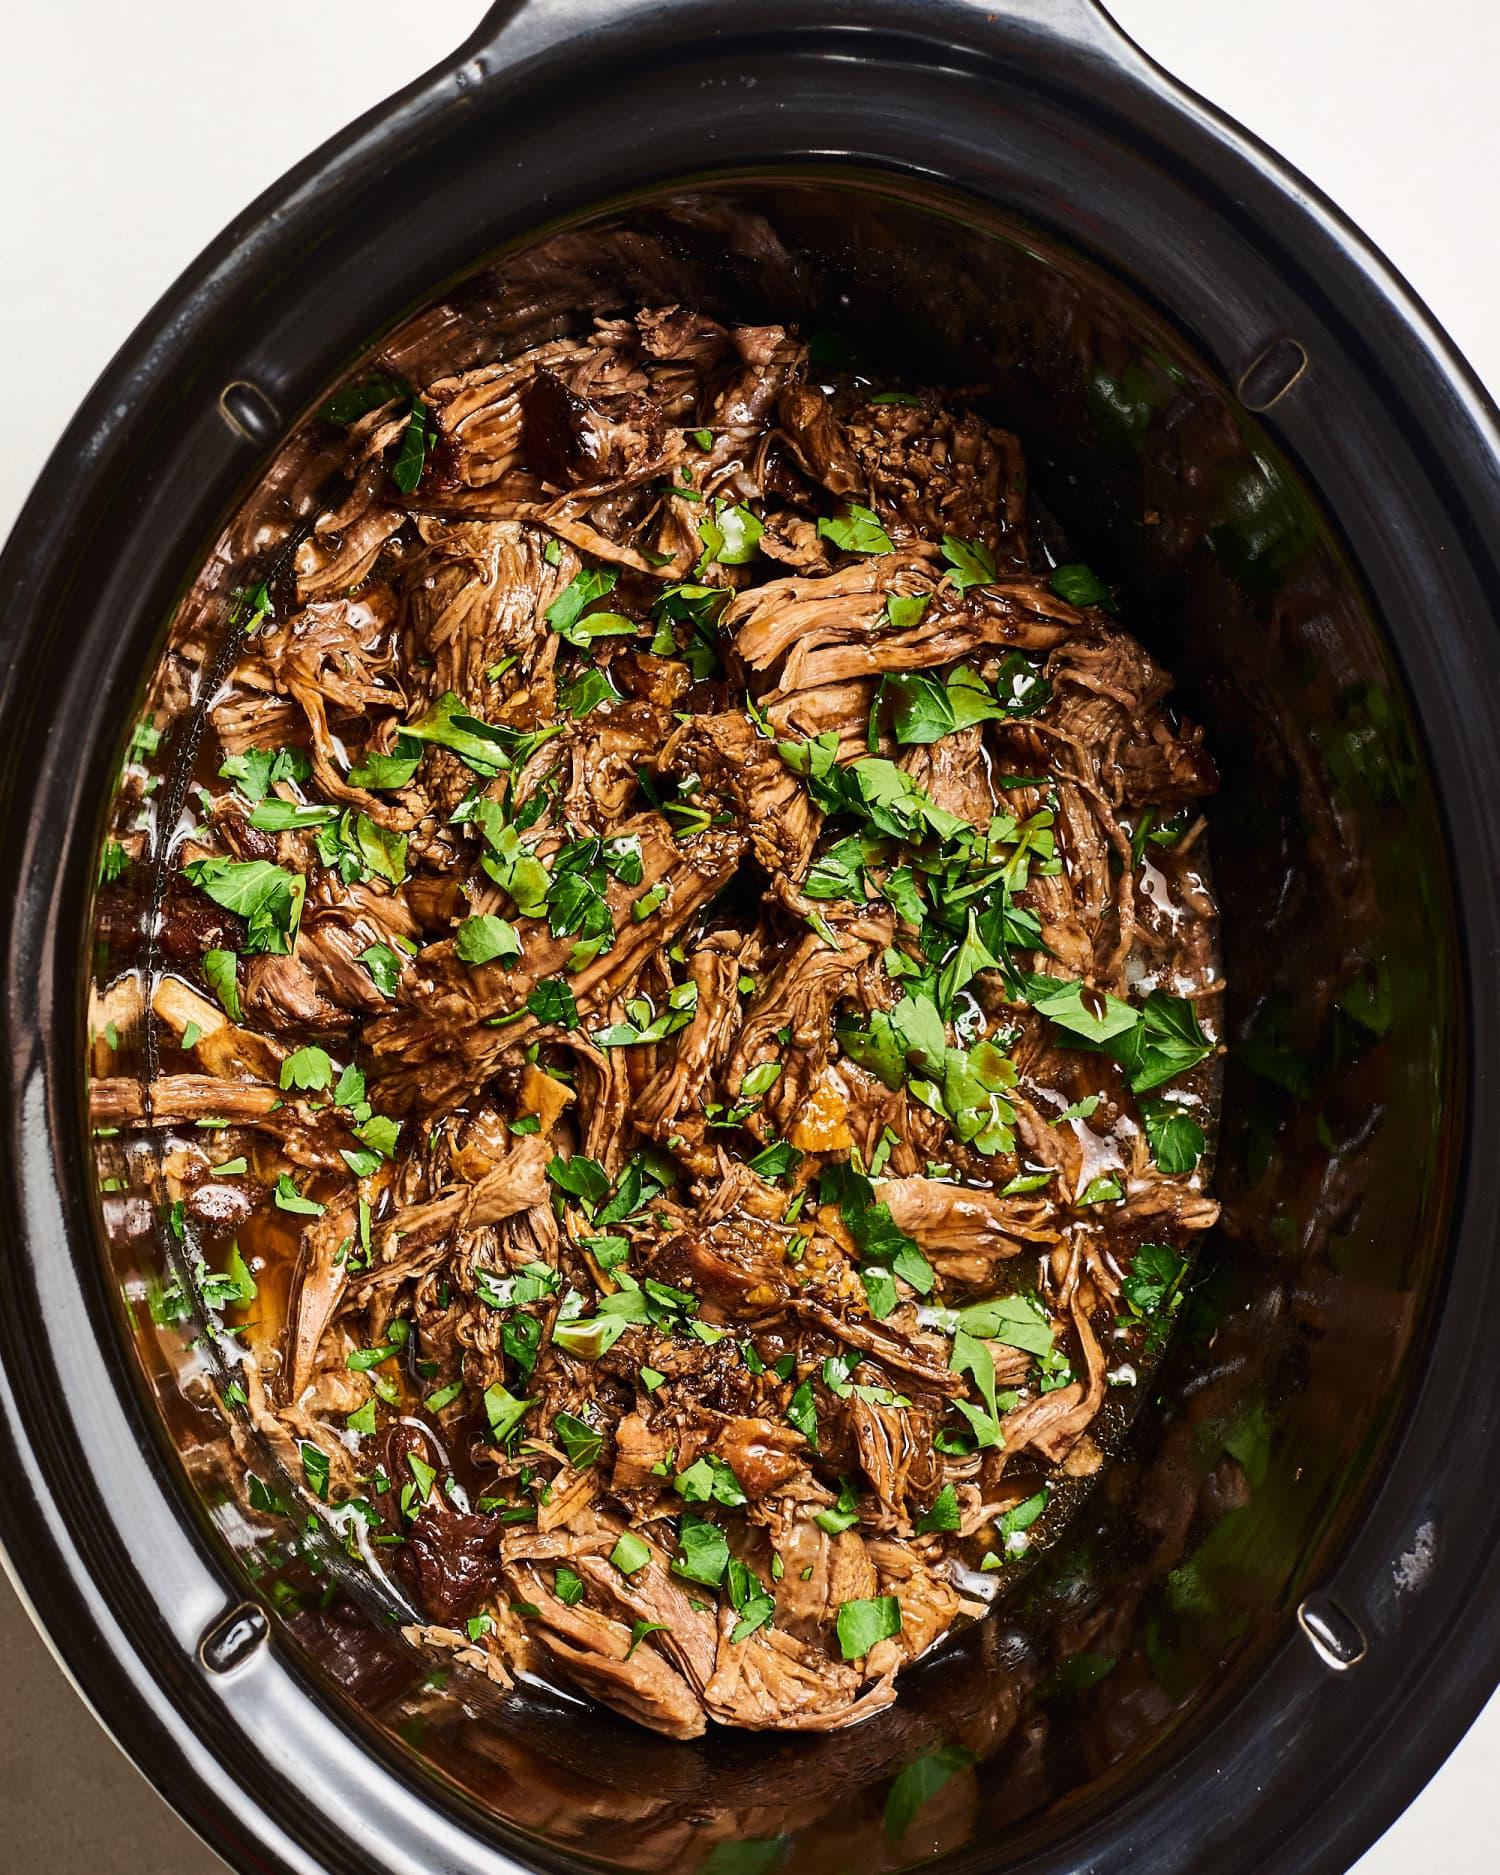 Recipe: Slow Cooker Shredded Balsamic Beef